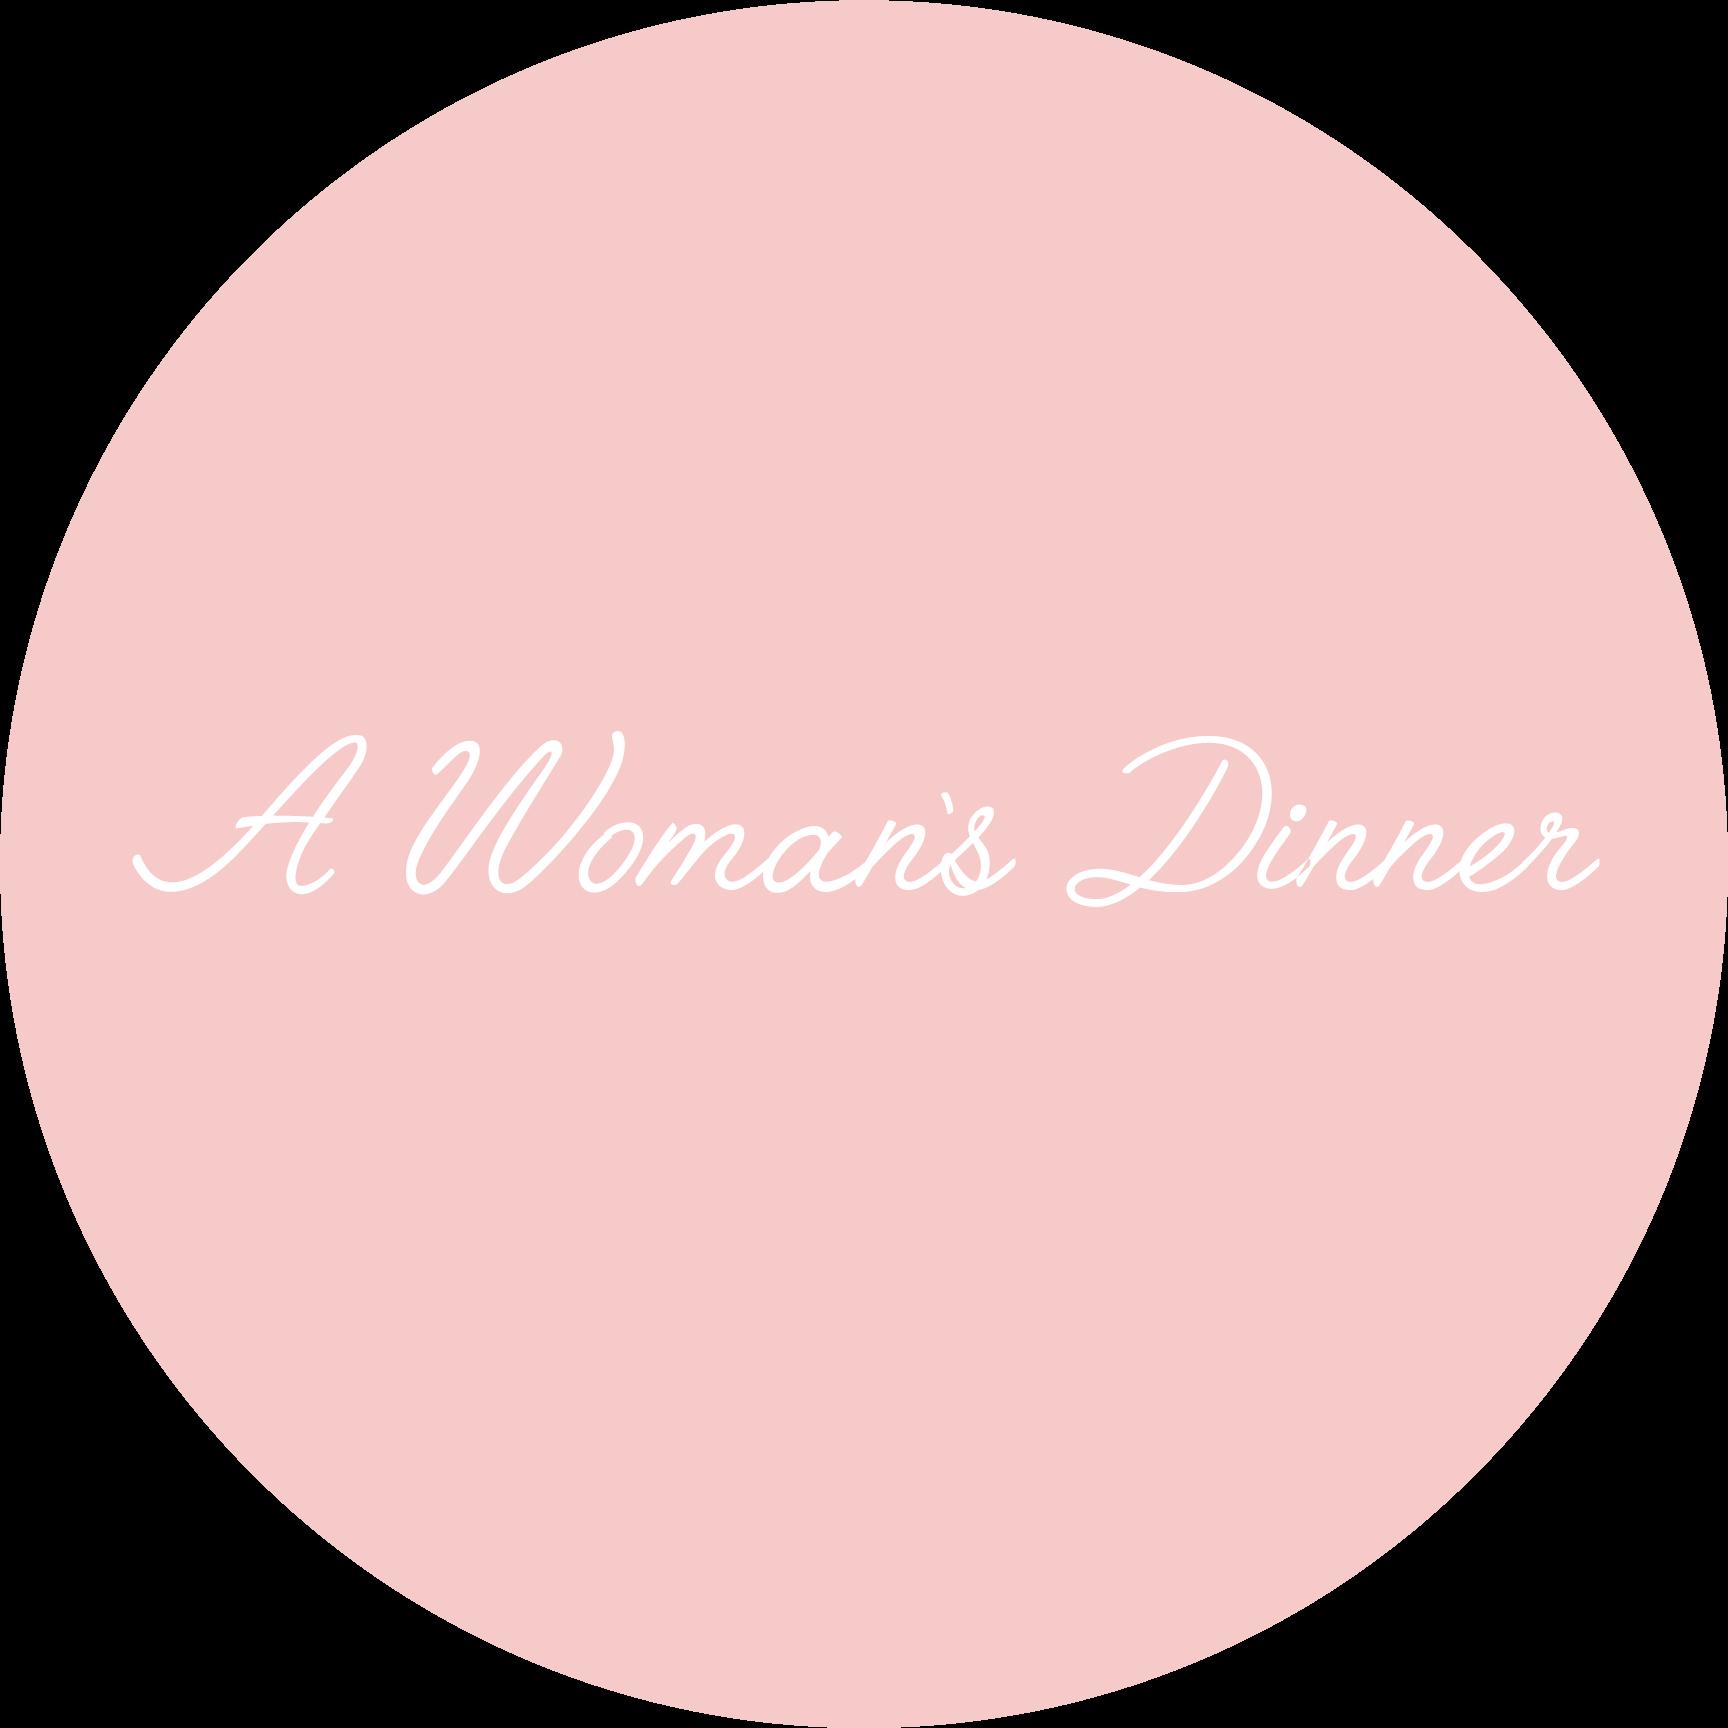 06.05.18 | A Woman's Dinner